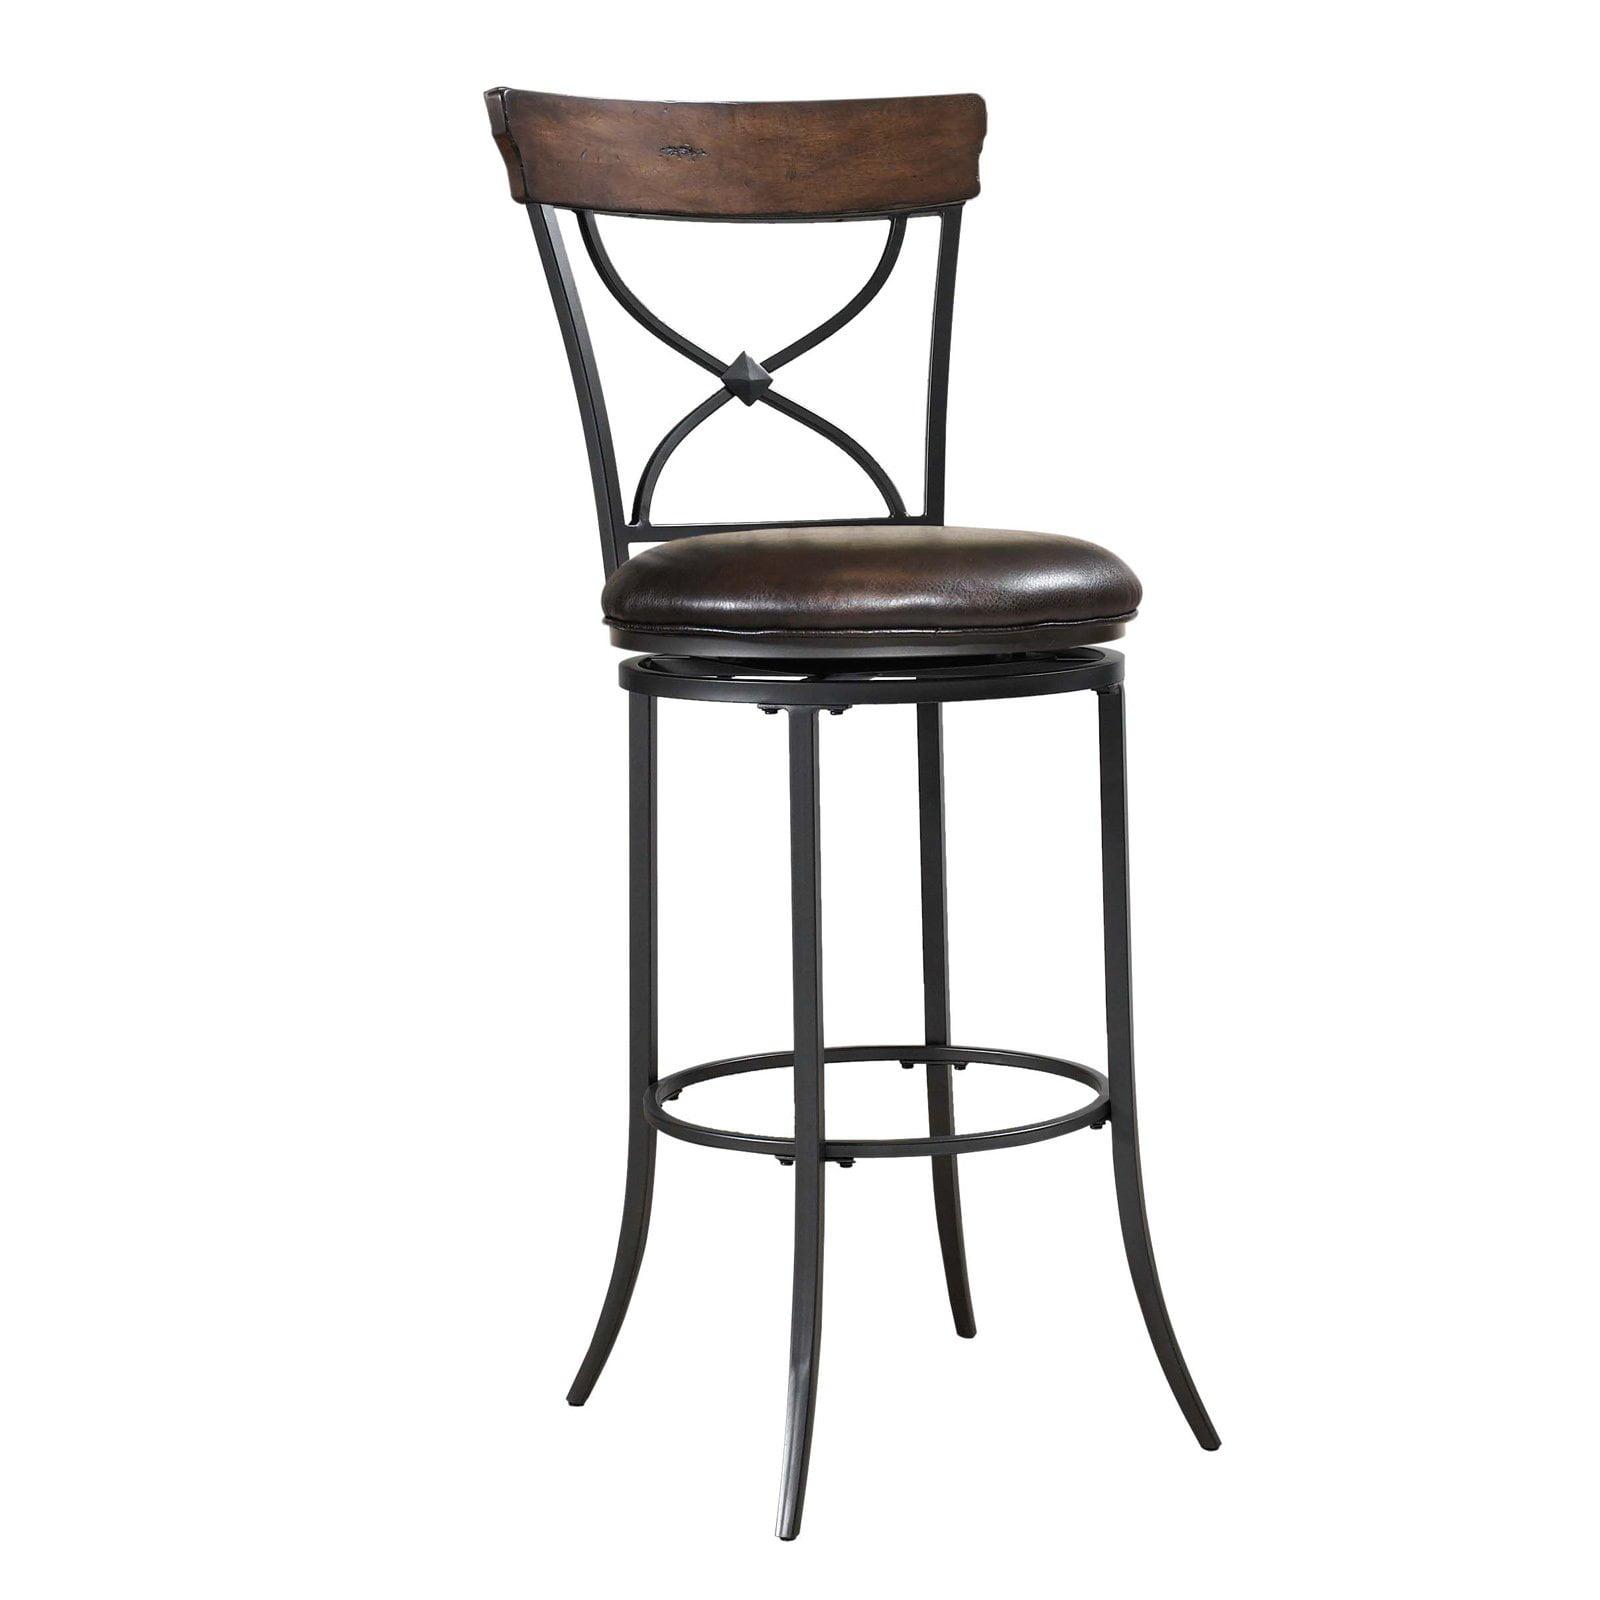 Hilale Furniture Cameron 44 5 X Back Swivel Bar Stool Chestnut Brown Finish